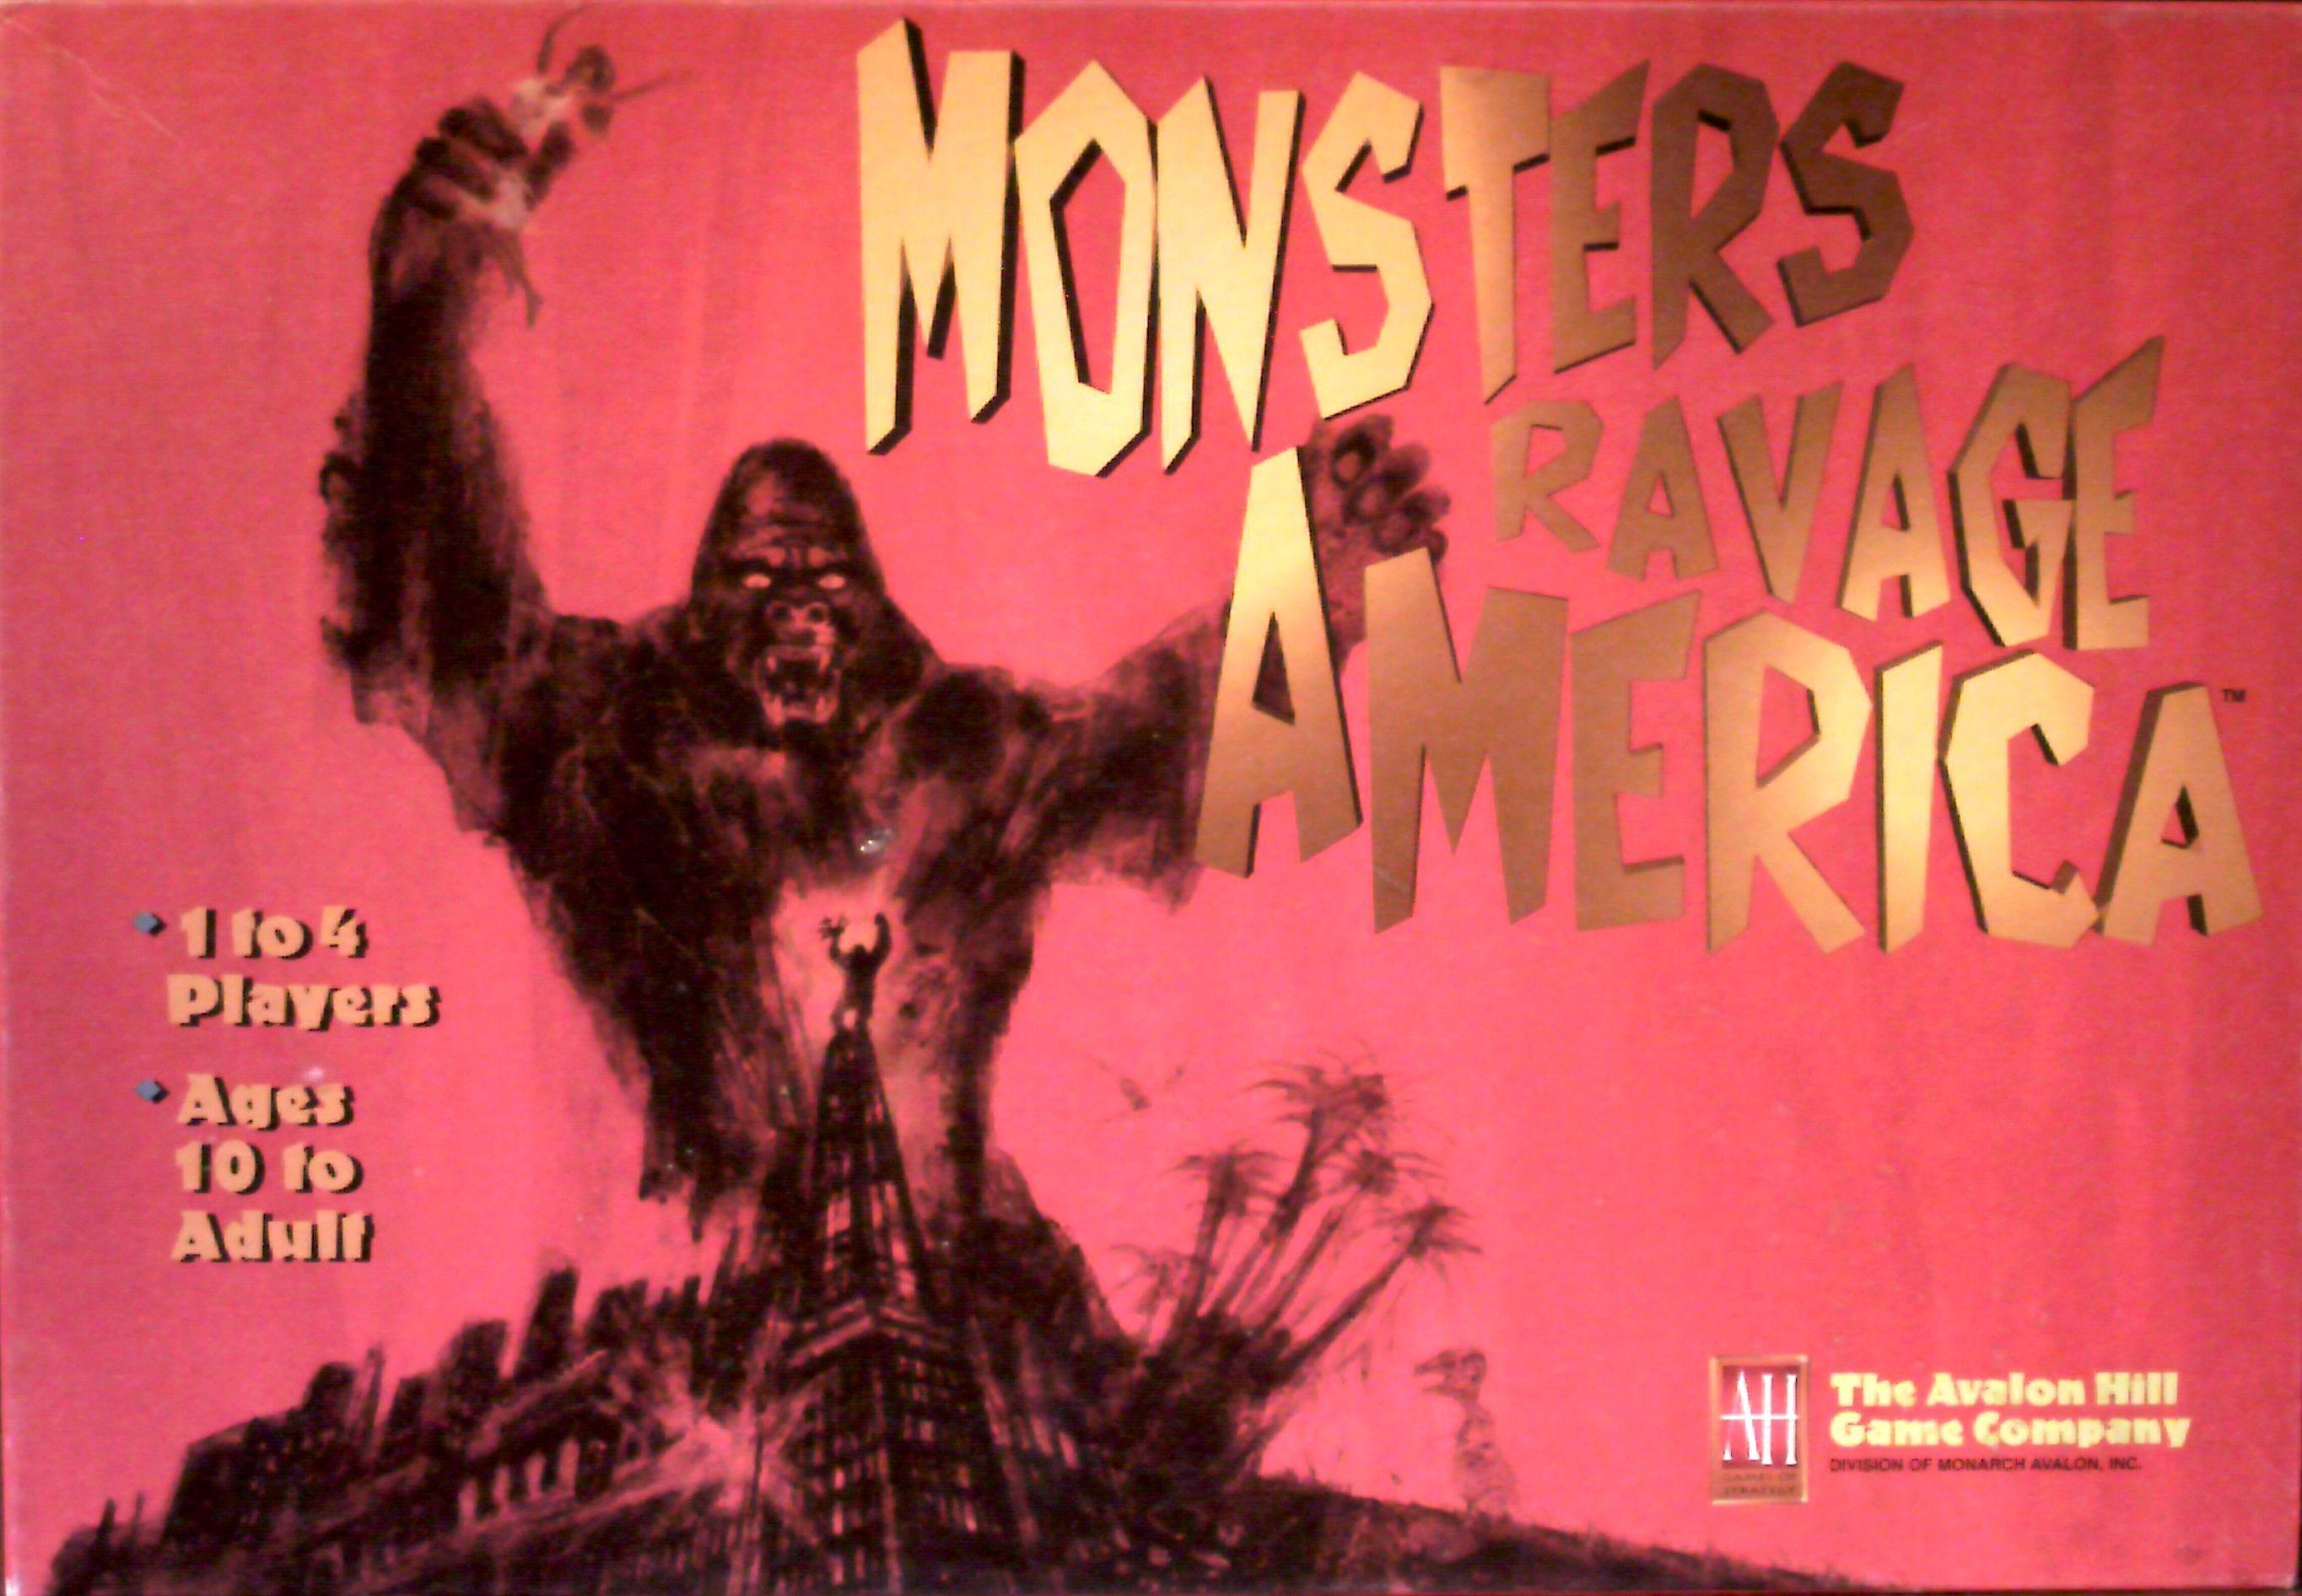 Monsters Ravage America